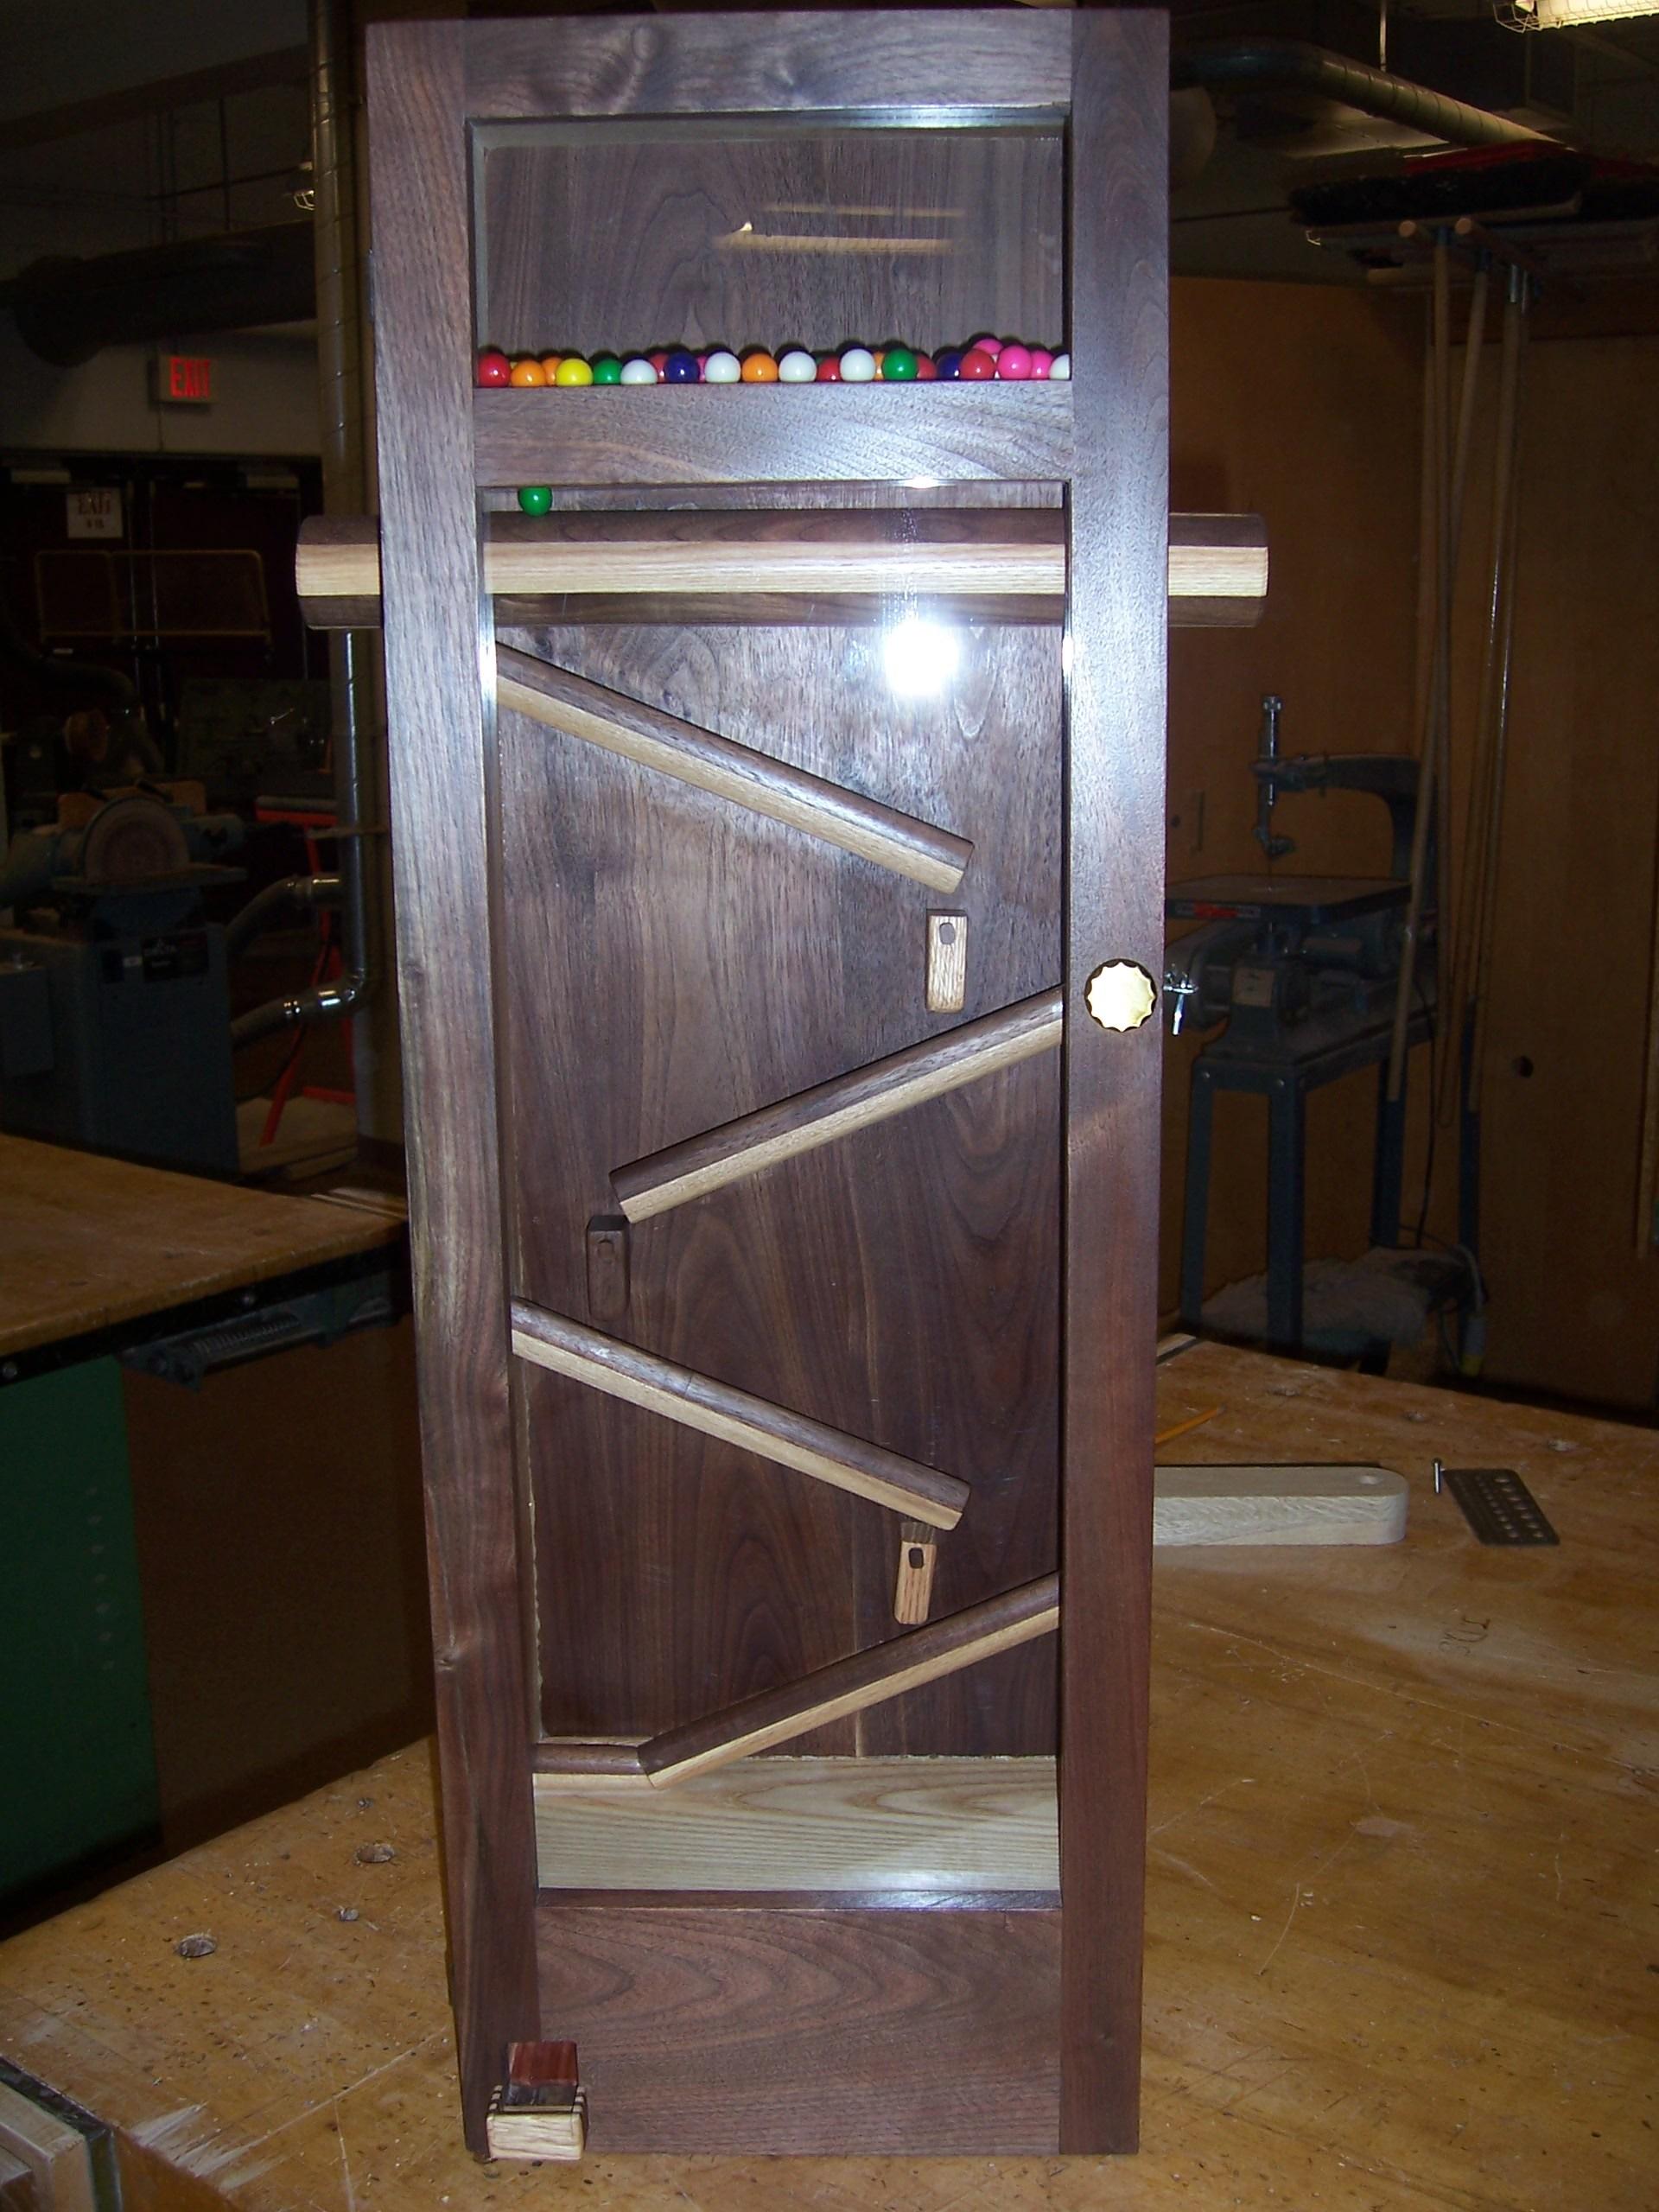 Gumball Machine-Wood Technology